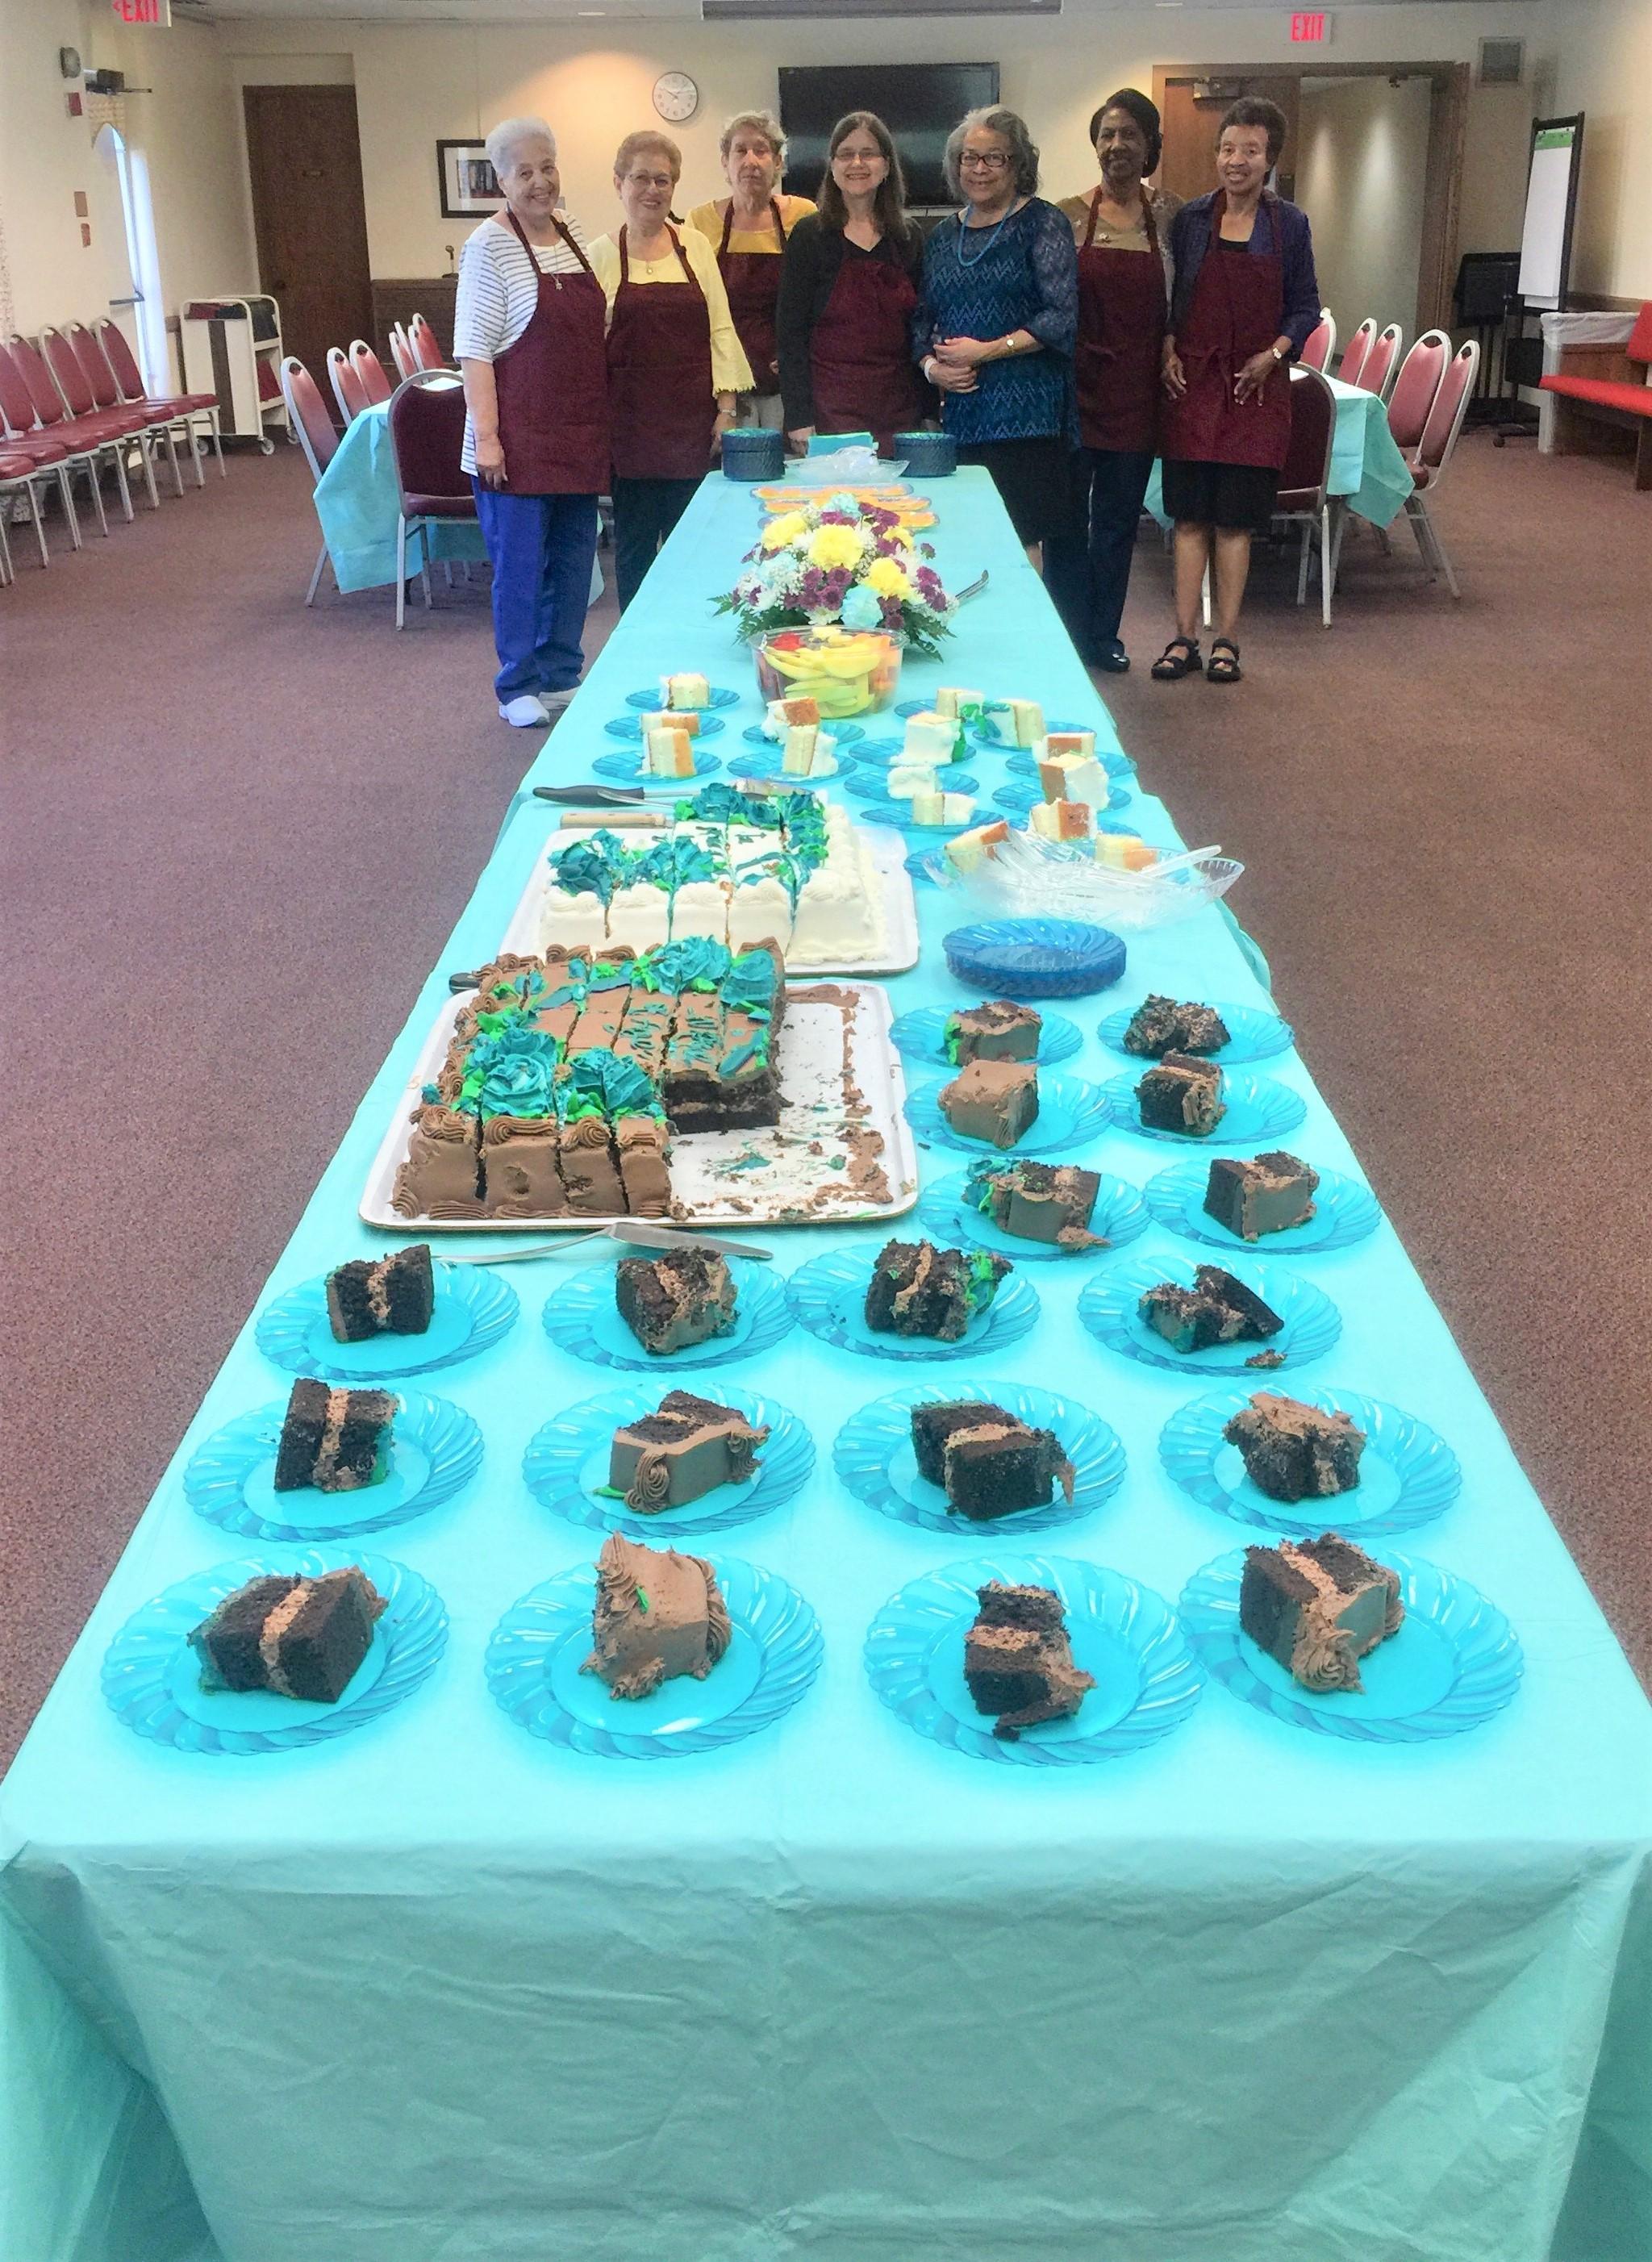 Cake table.jpeg